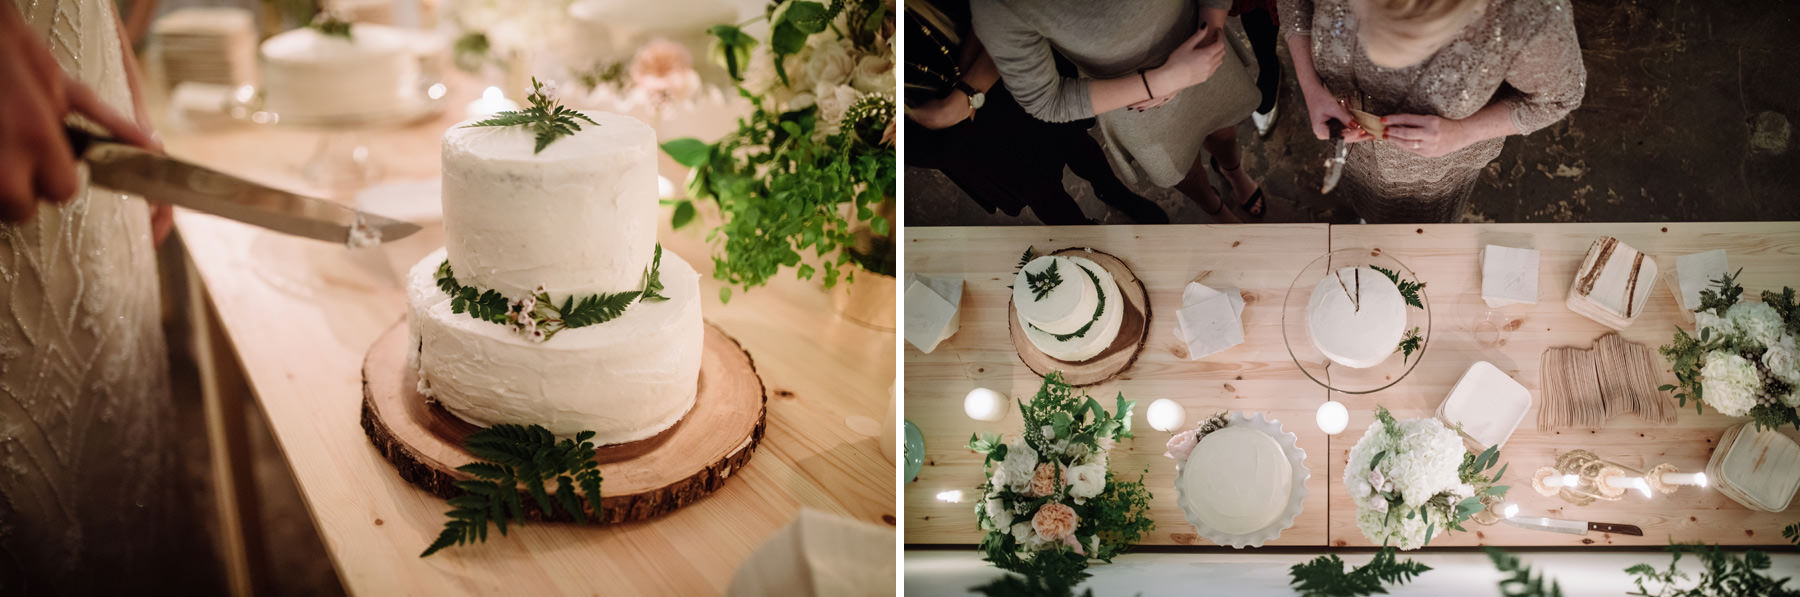 Memorial Presbyterian Wedding in St. Louis Missouri_Kindling Wedding Photography052.JPG